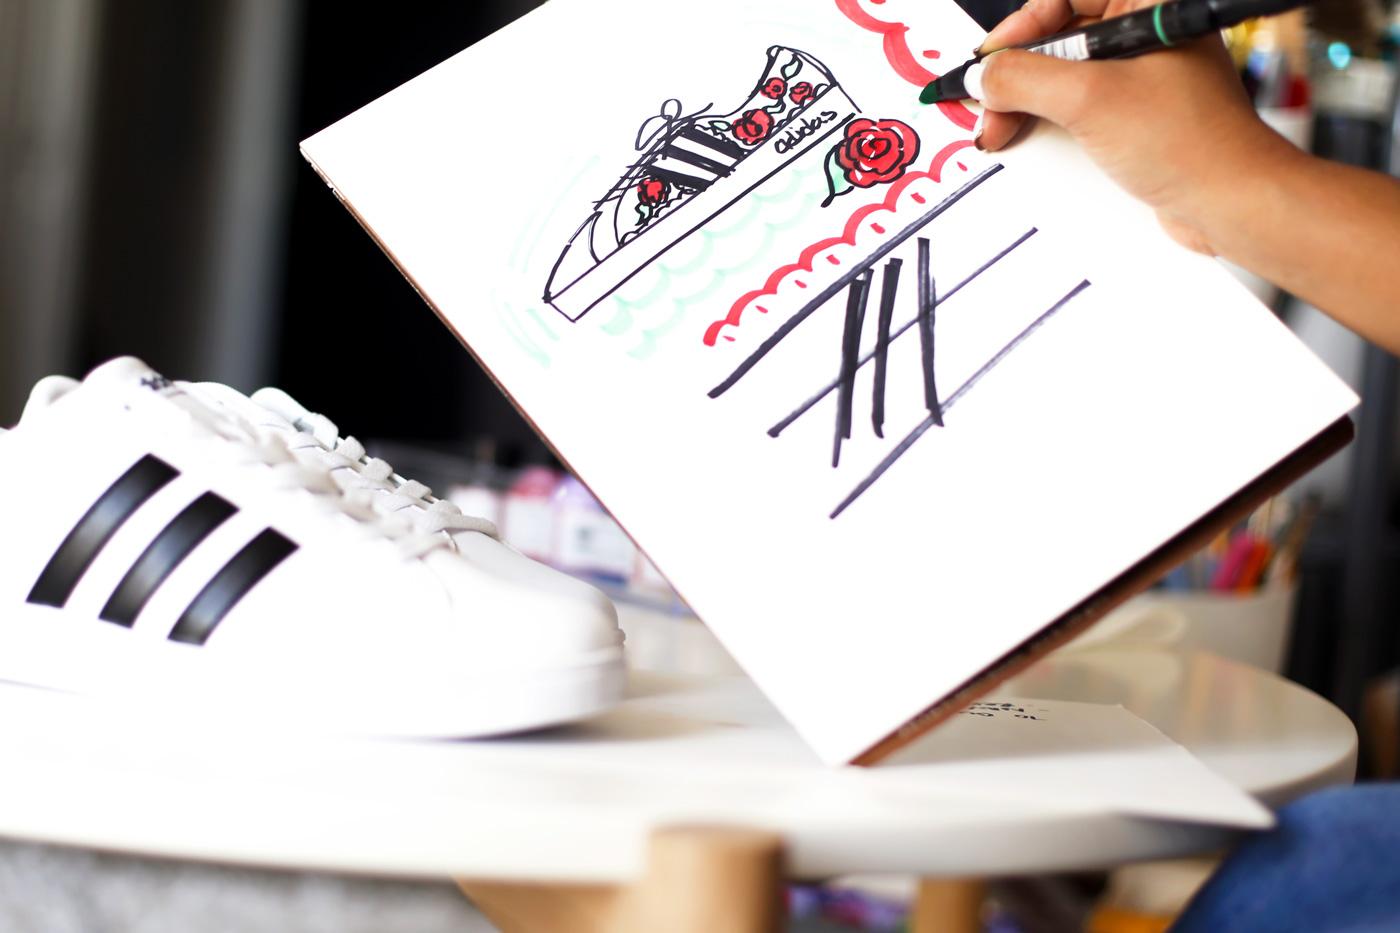 TAOS-Famous-Footwear-Stepforward-Adidas